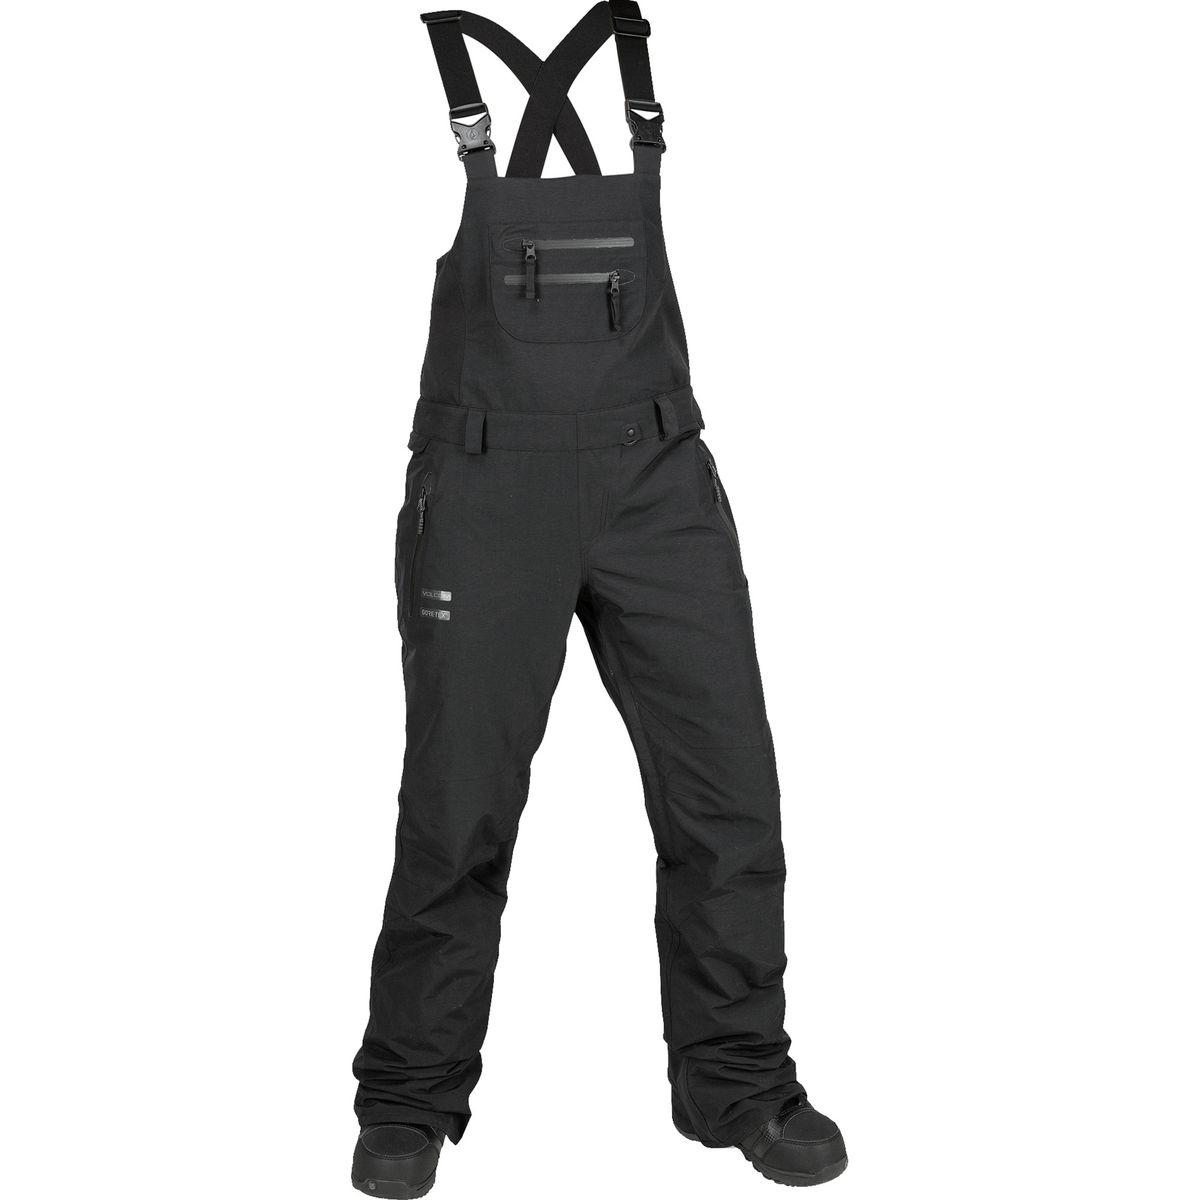 Volcom Aria GTX Bib Overall Pant - Women